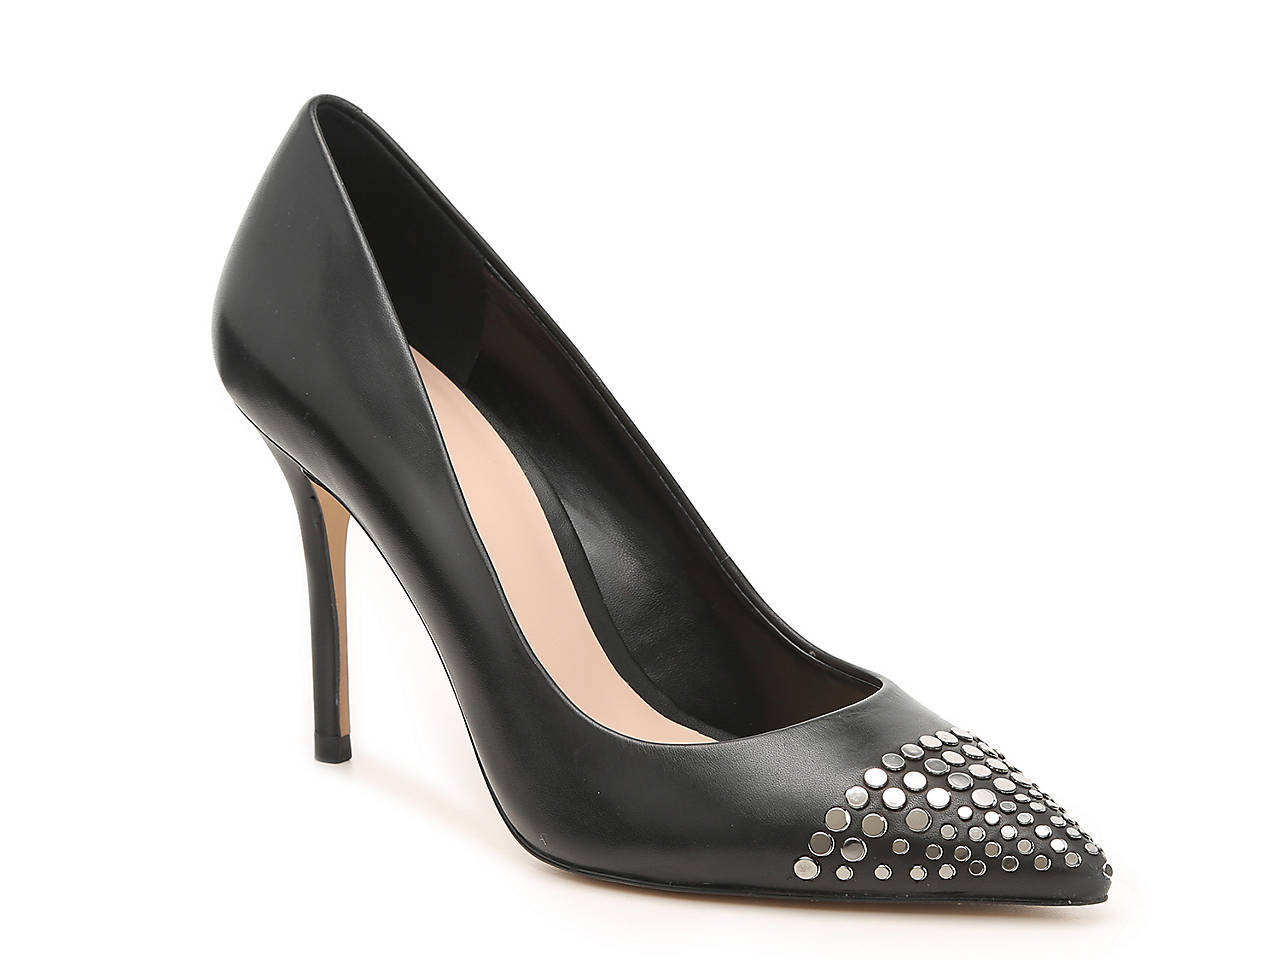 9a86644e9b58 Aldo Craysa Pump Women s Shoes